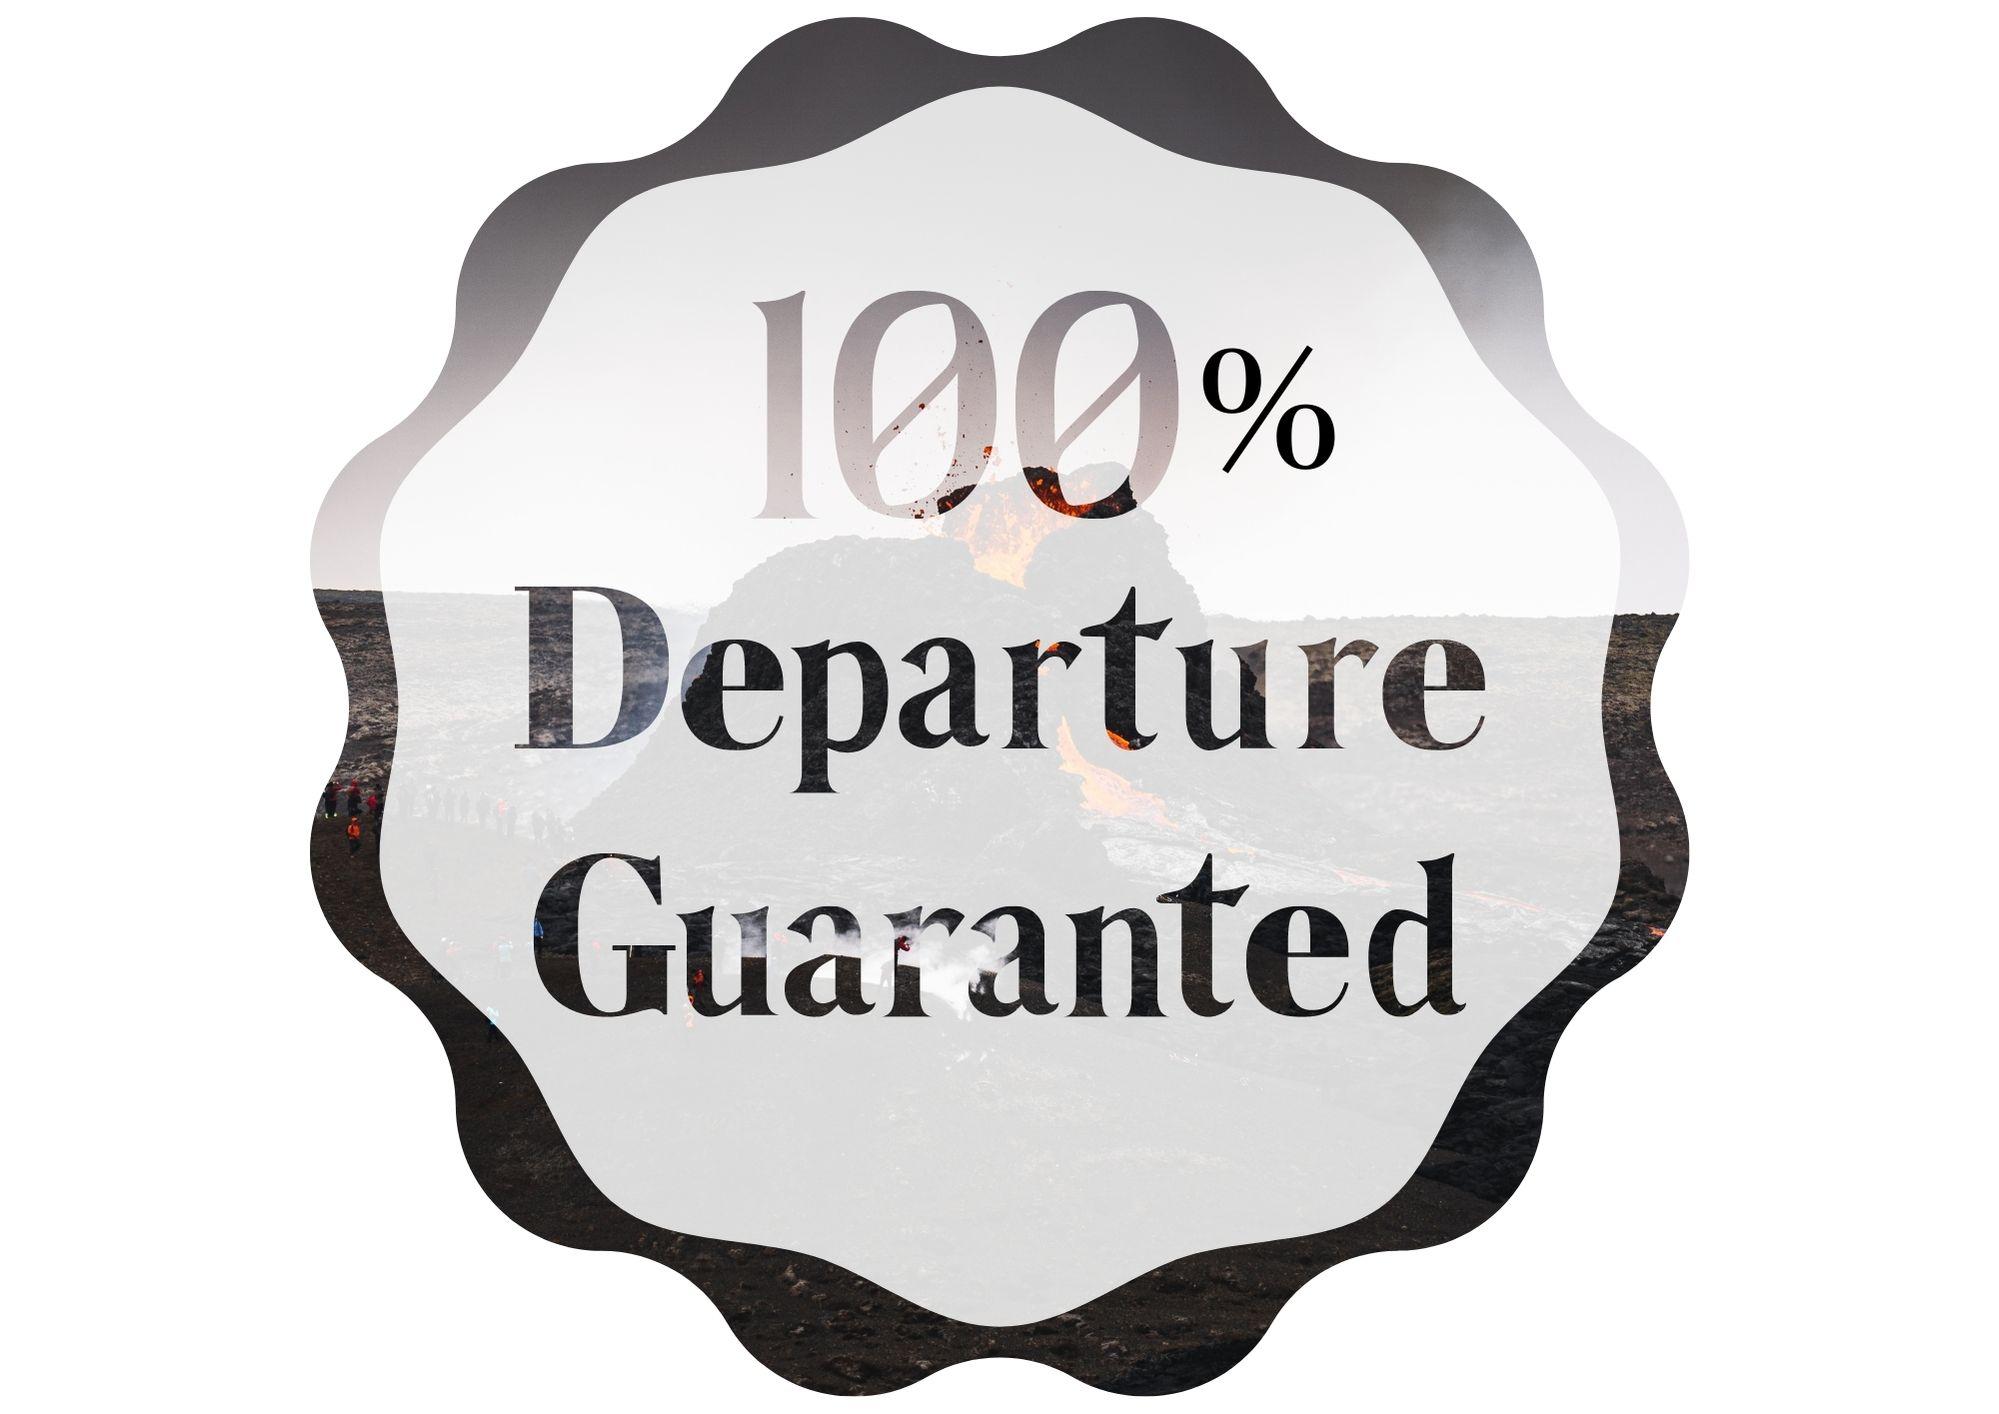 departure guaranteed